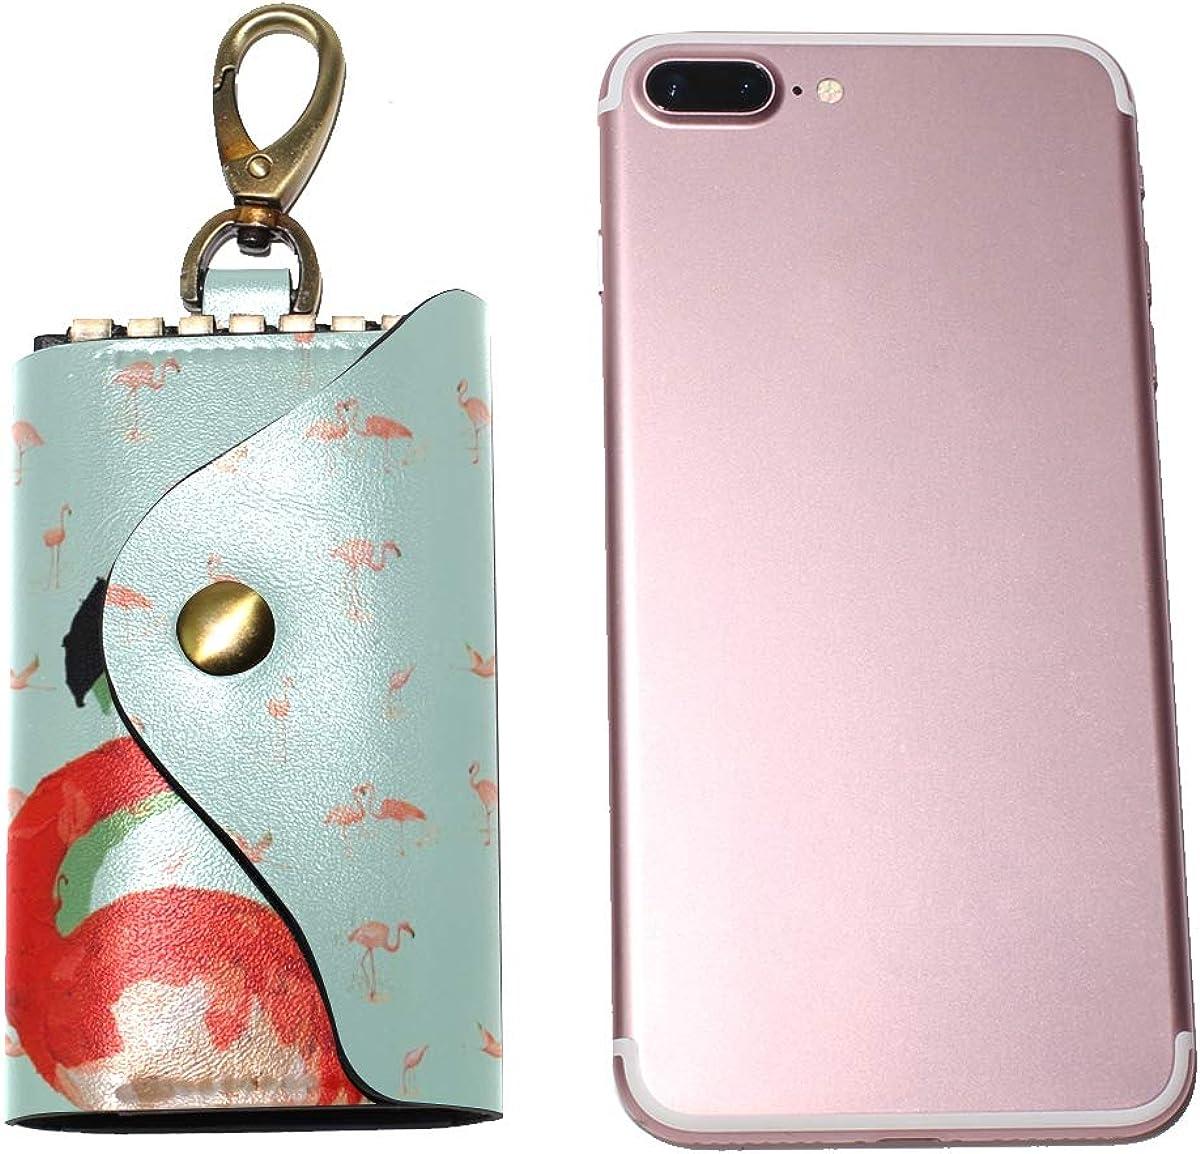 KEAKIA Flamingos Leather Key Case Wallets Tri-fold Key Holder Keychains with 6 Hooks 2 Slot Snap Closure for Men Women